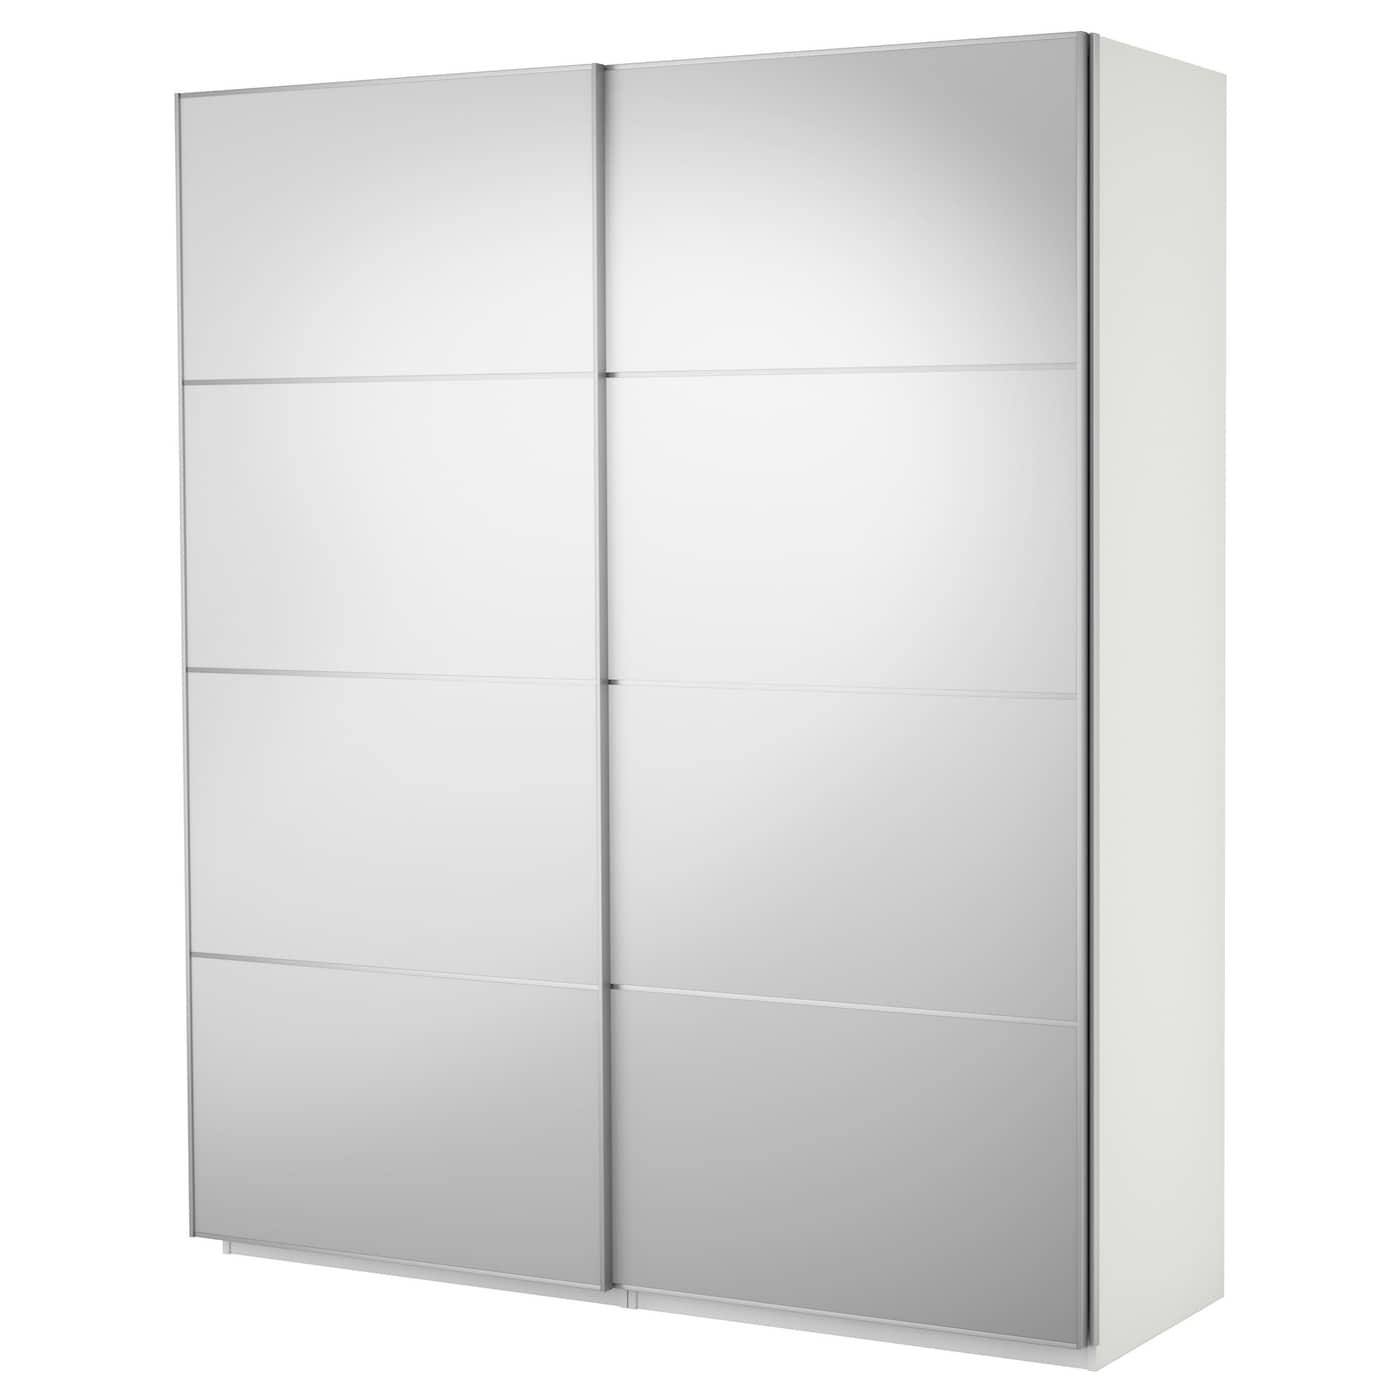 pax wardrobe with sliding doors white auli mirror glass. Black Bedroom Furniture Sets. Home Design Ideas